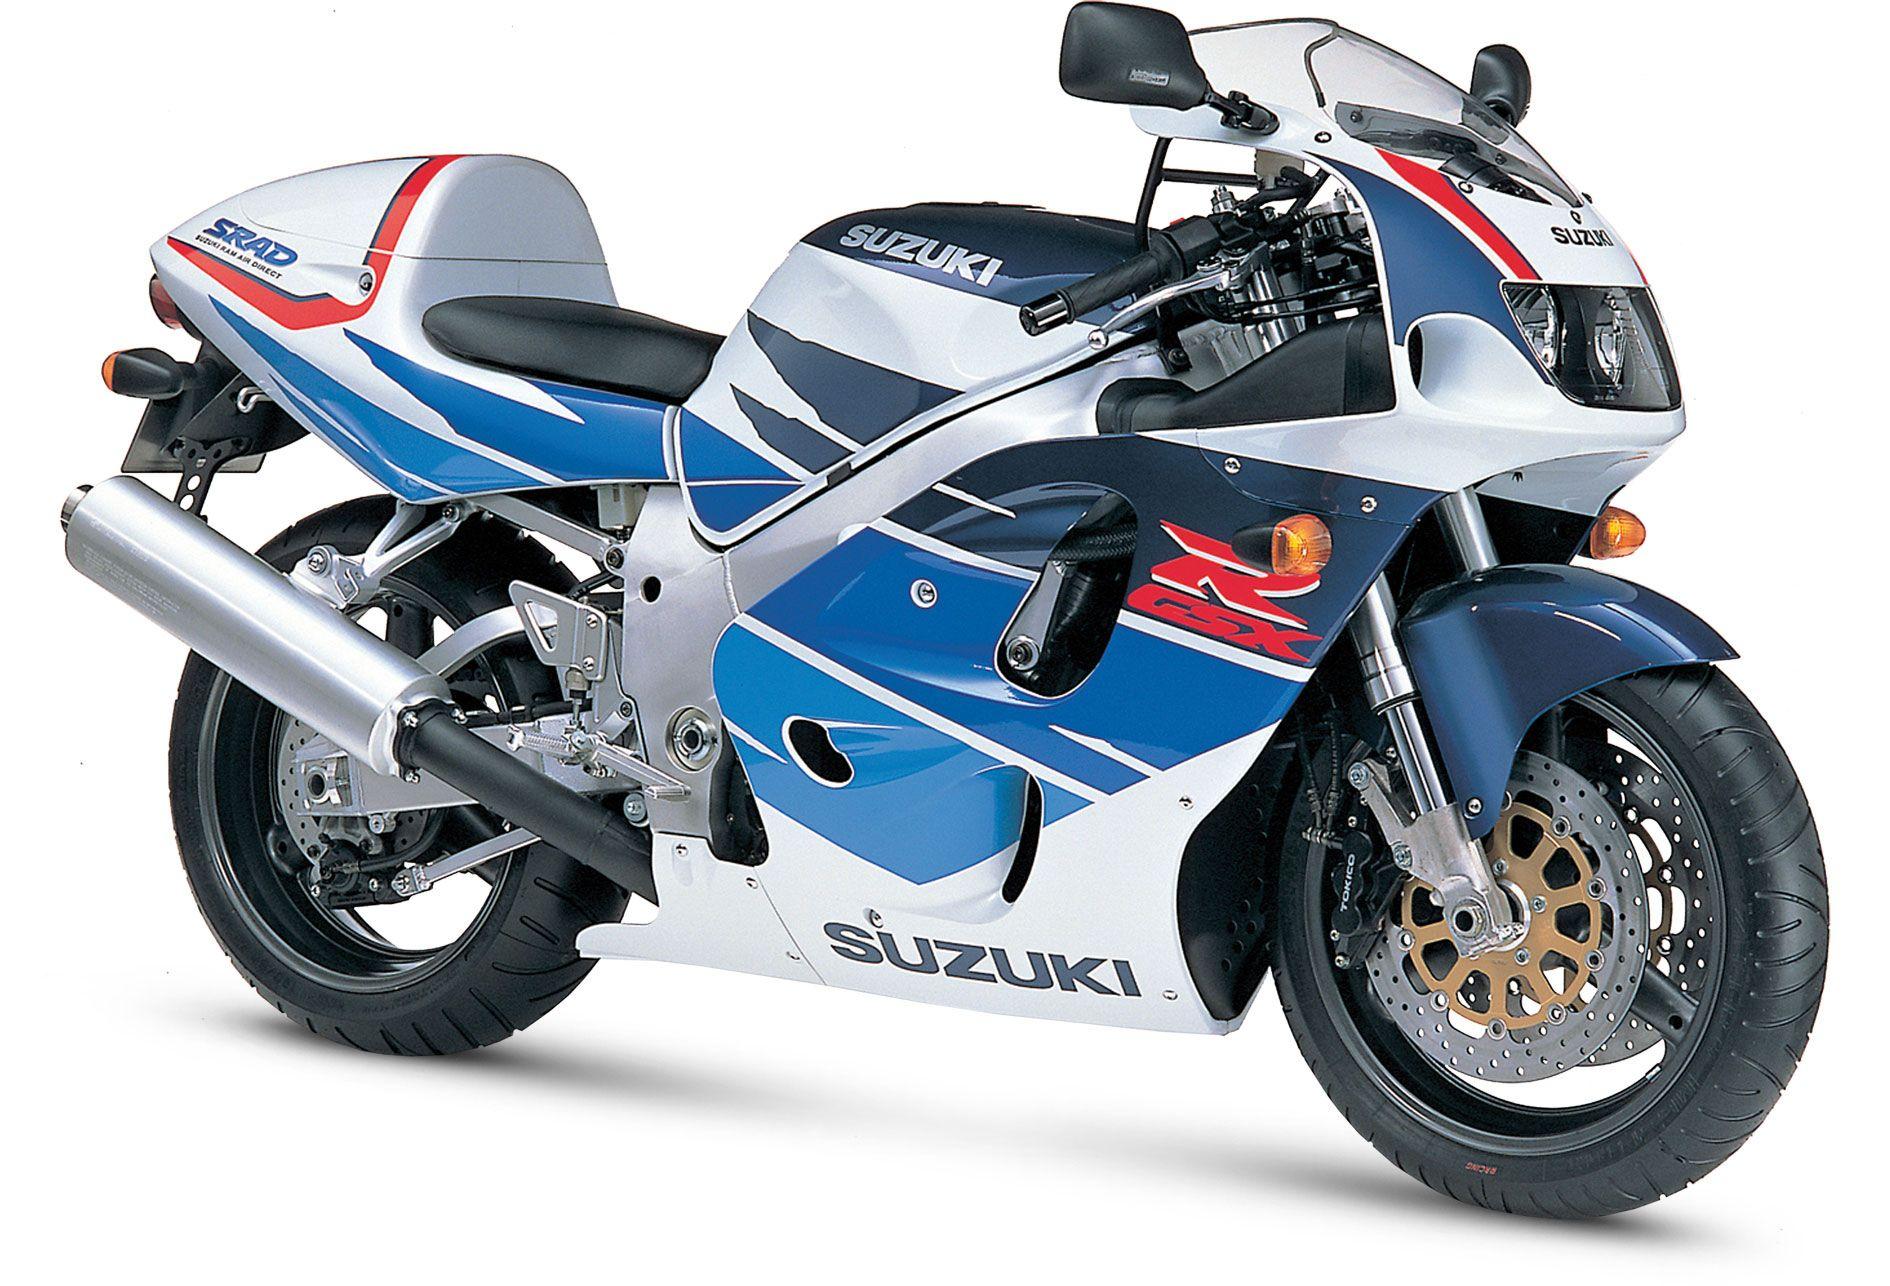 Gsxr 750 1996 Srad Suzuki Ram Air Direct 90 S Sports Bikes Are Sweeeet Suzuki Gsx R 750 Suzuki Gsxr Suzuki Motorcycle